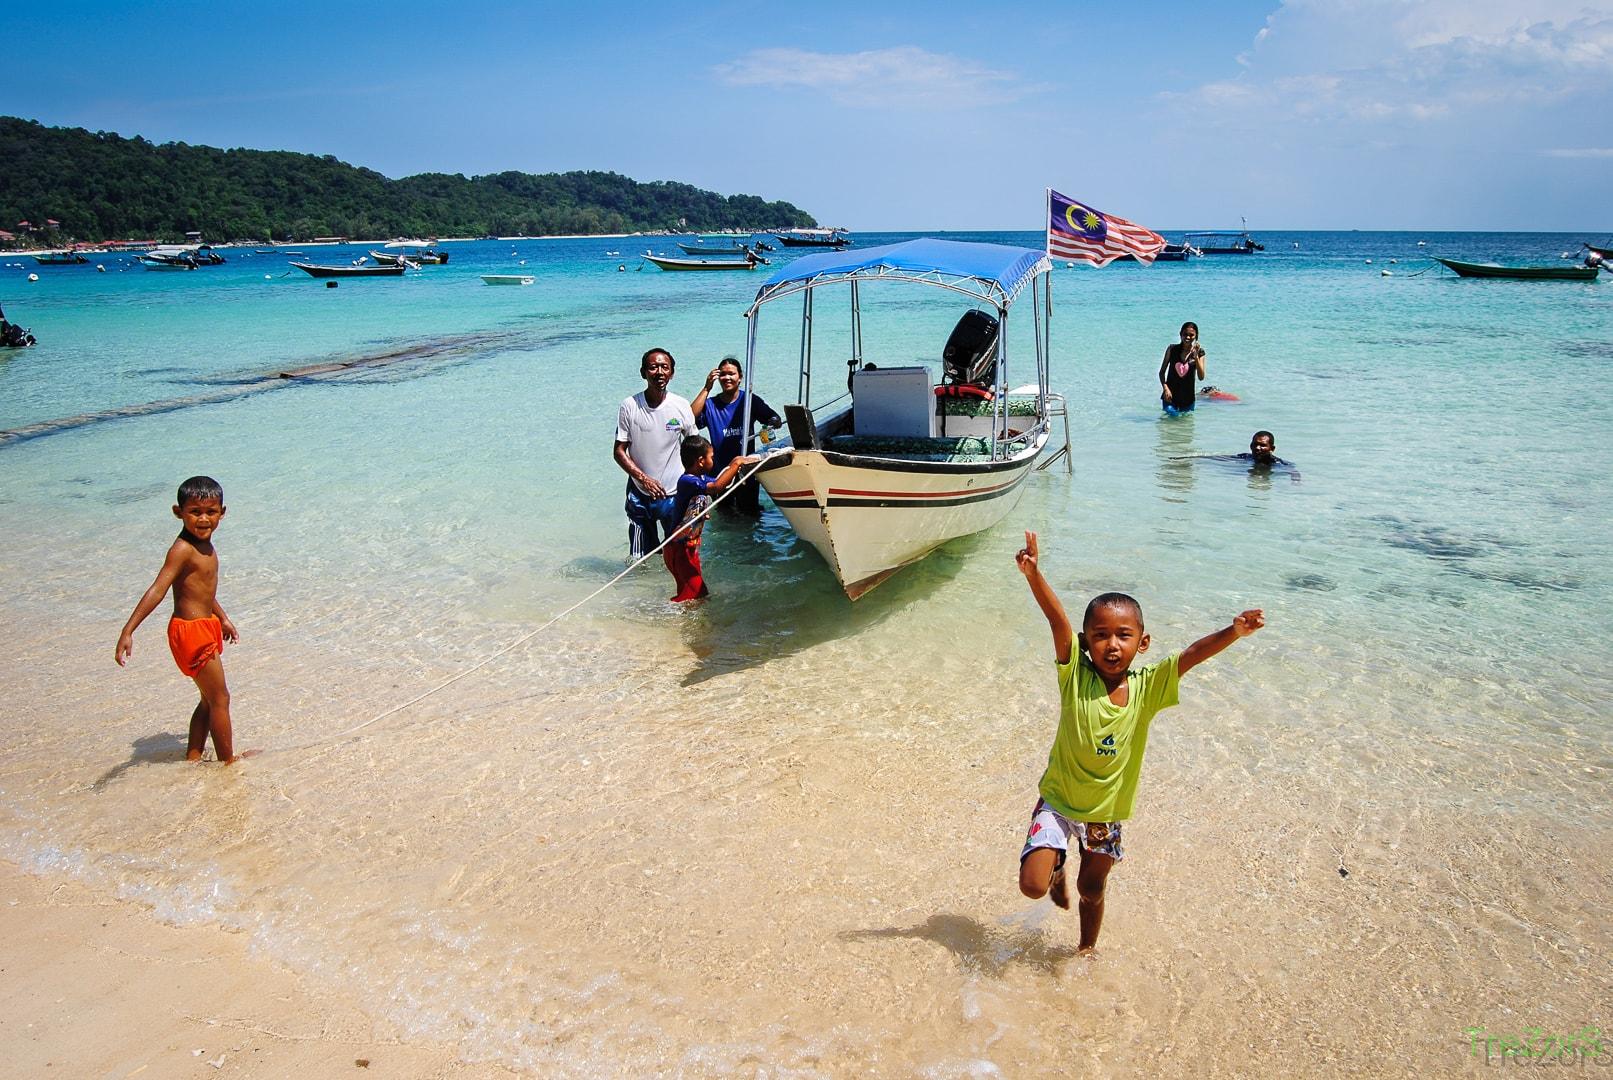 trezors-photography-photographe-professionnel-toulouse-31-voyage-paysage-malaysia